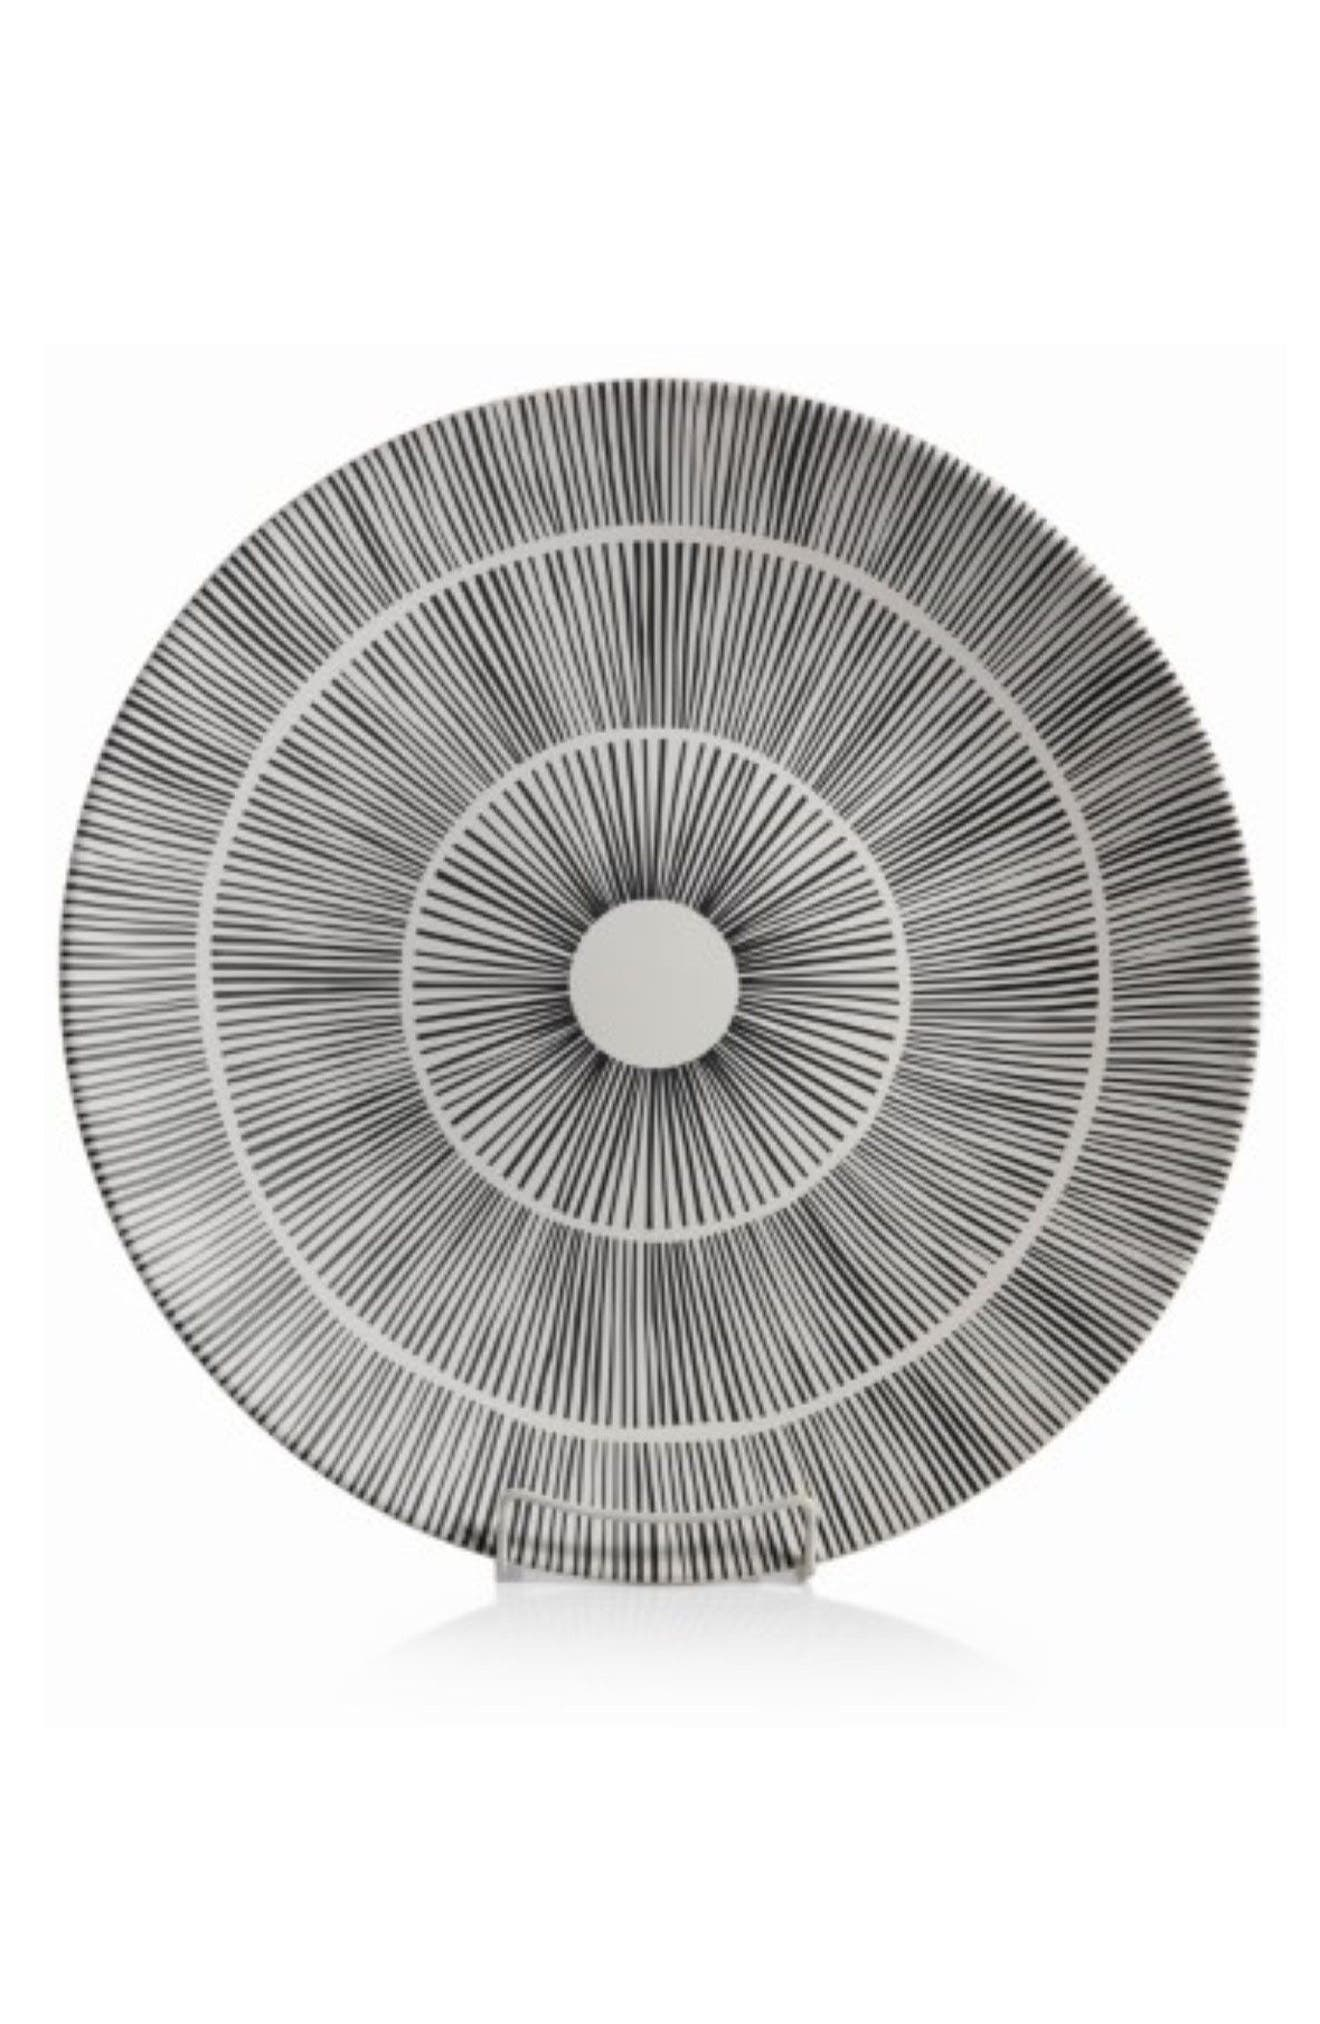 Marquesa Ceramic Platter,                             Main thumbnail 1, color,                             100